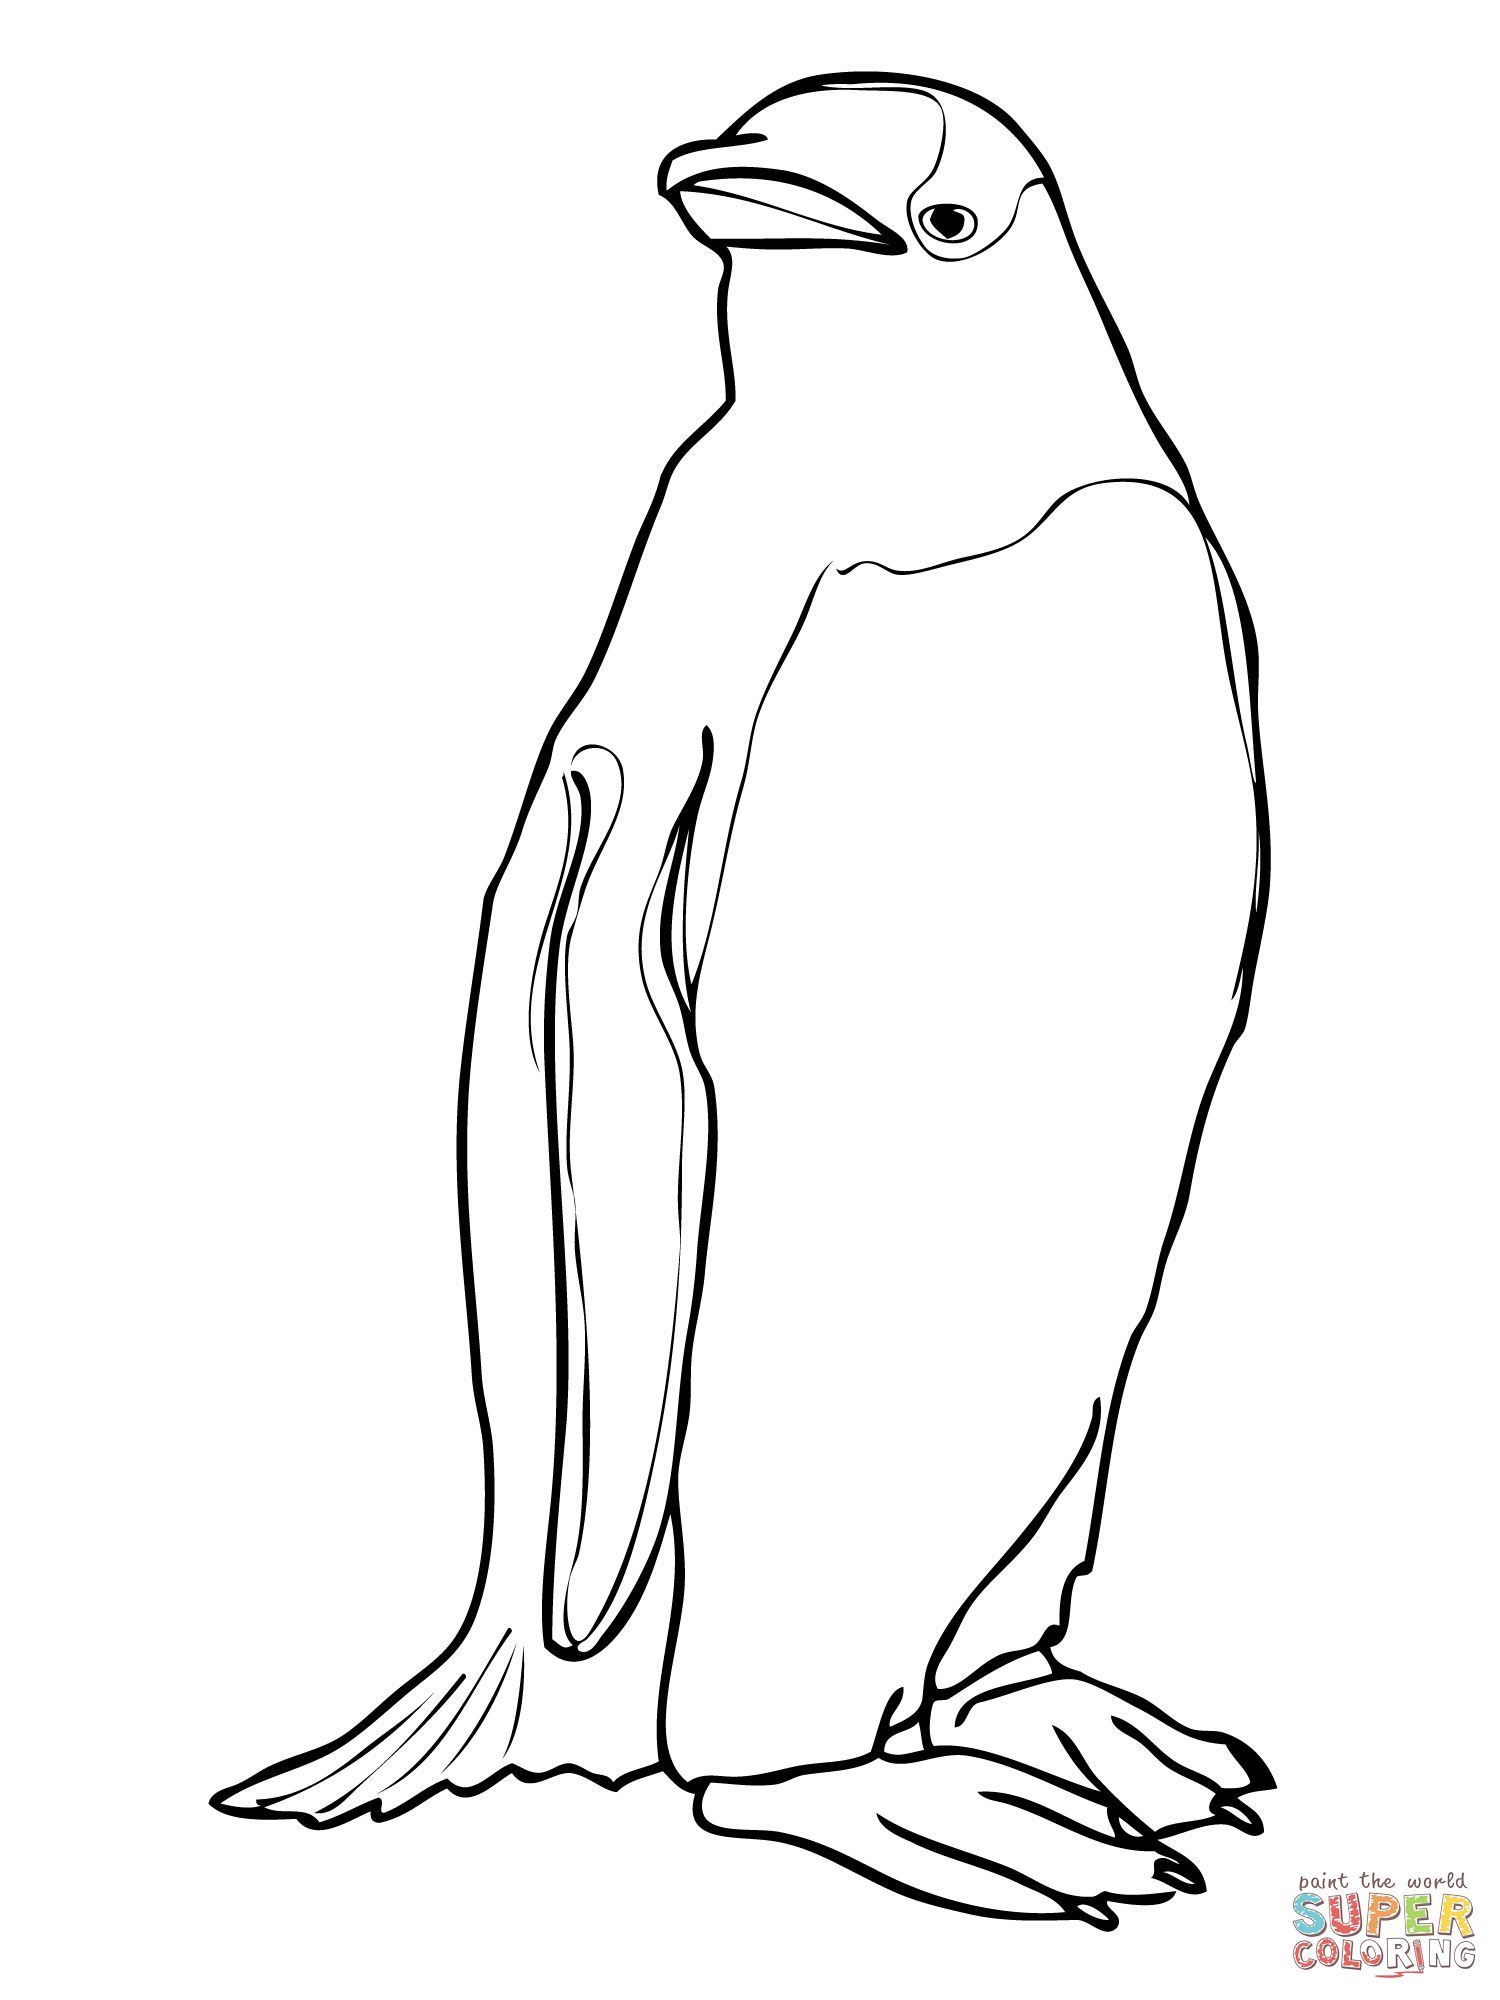 Gentoo Penguin Coloring Online Penguin coloring, Penguin